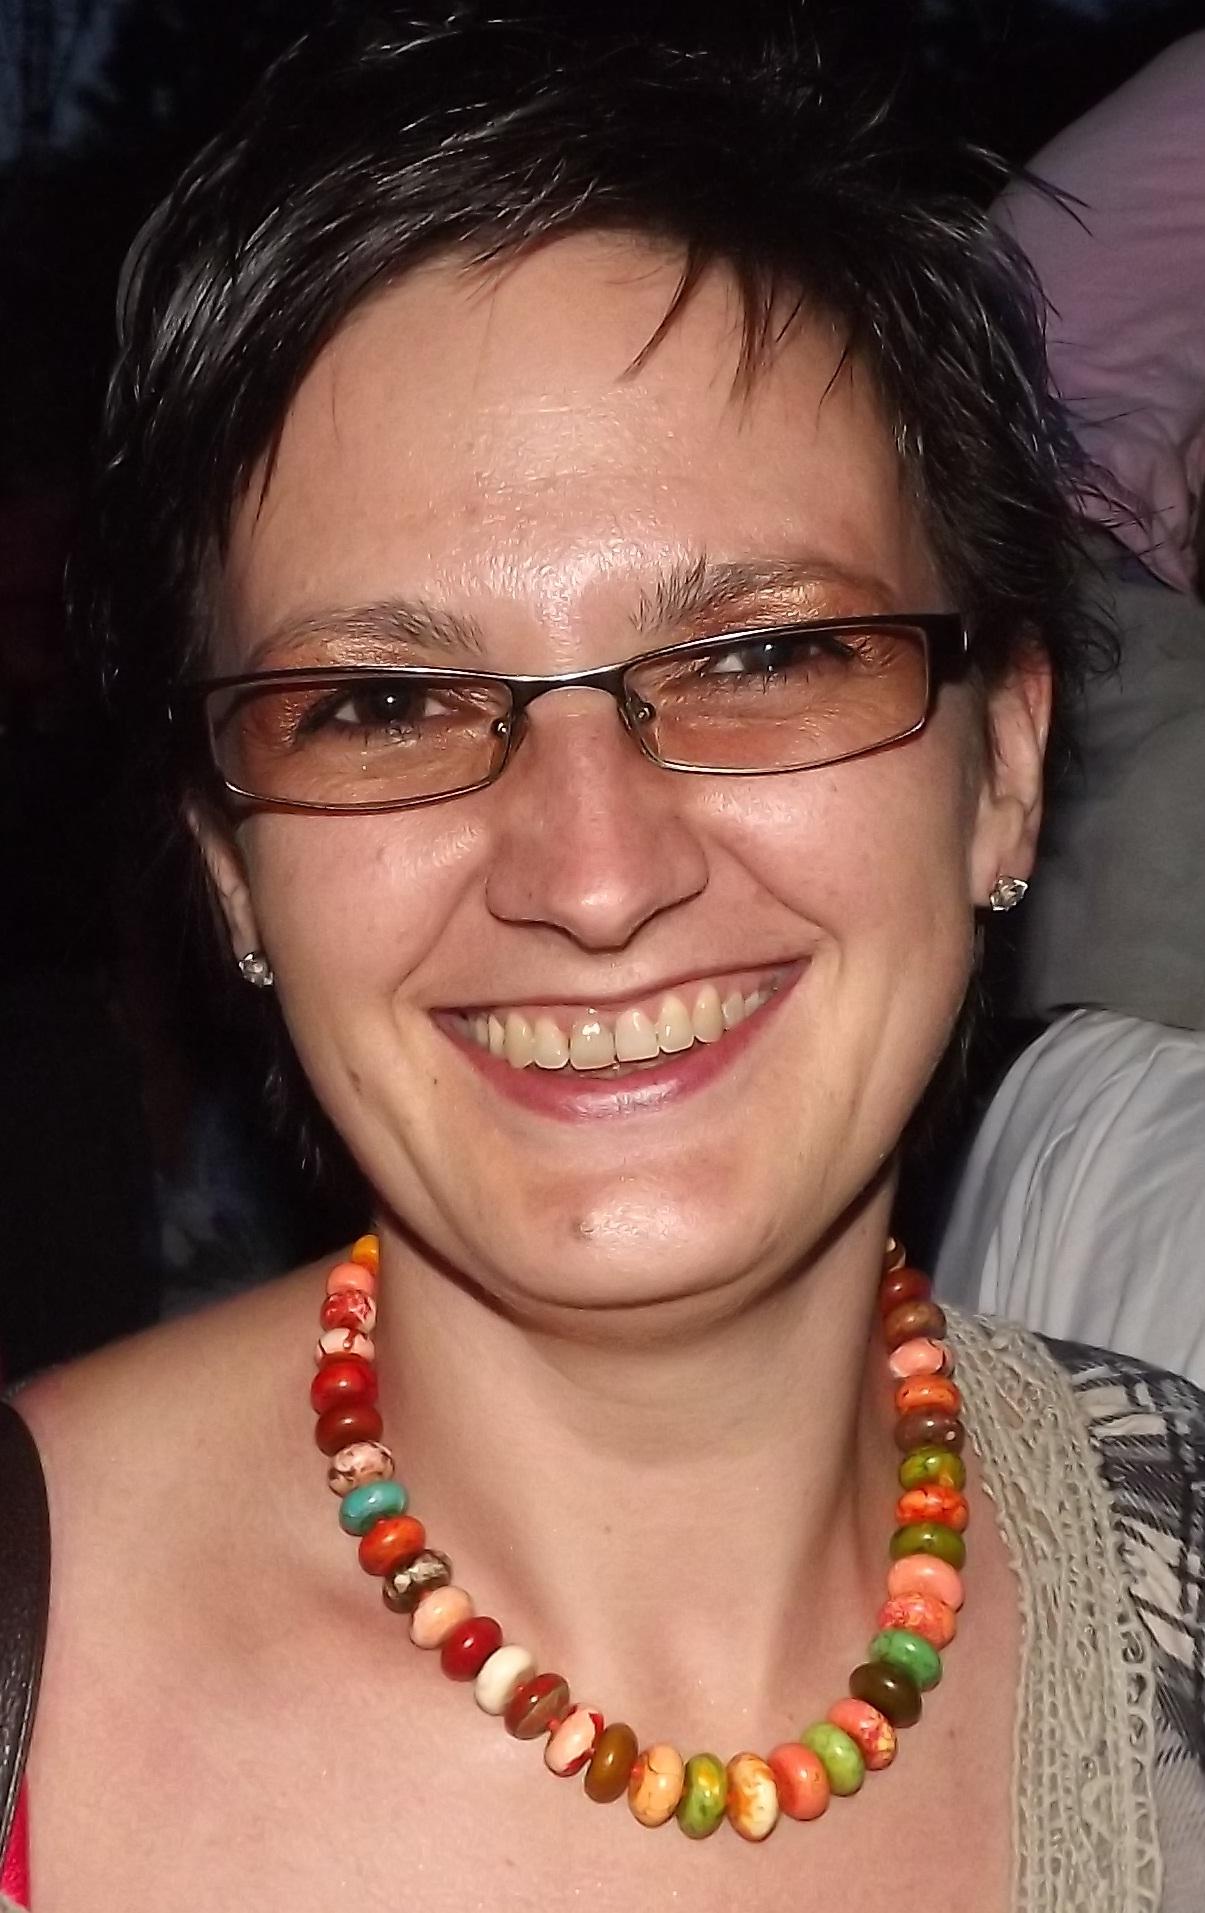 Forum on this topic: Larisa Oleynik born June 7, 1981 (age 37), jahmil-french/